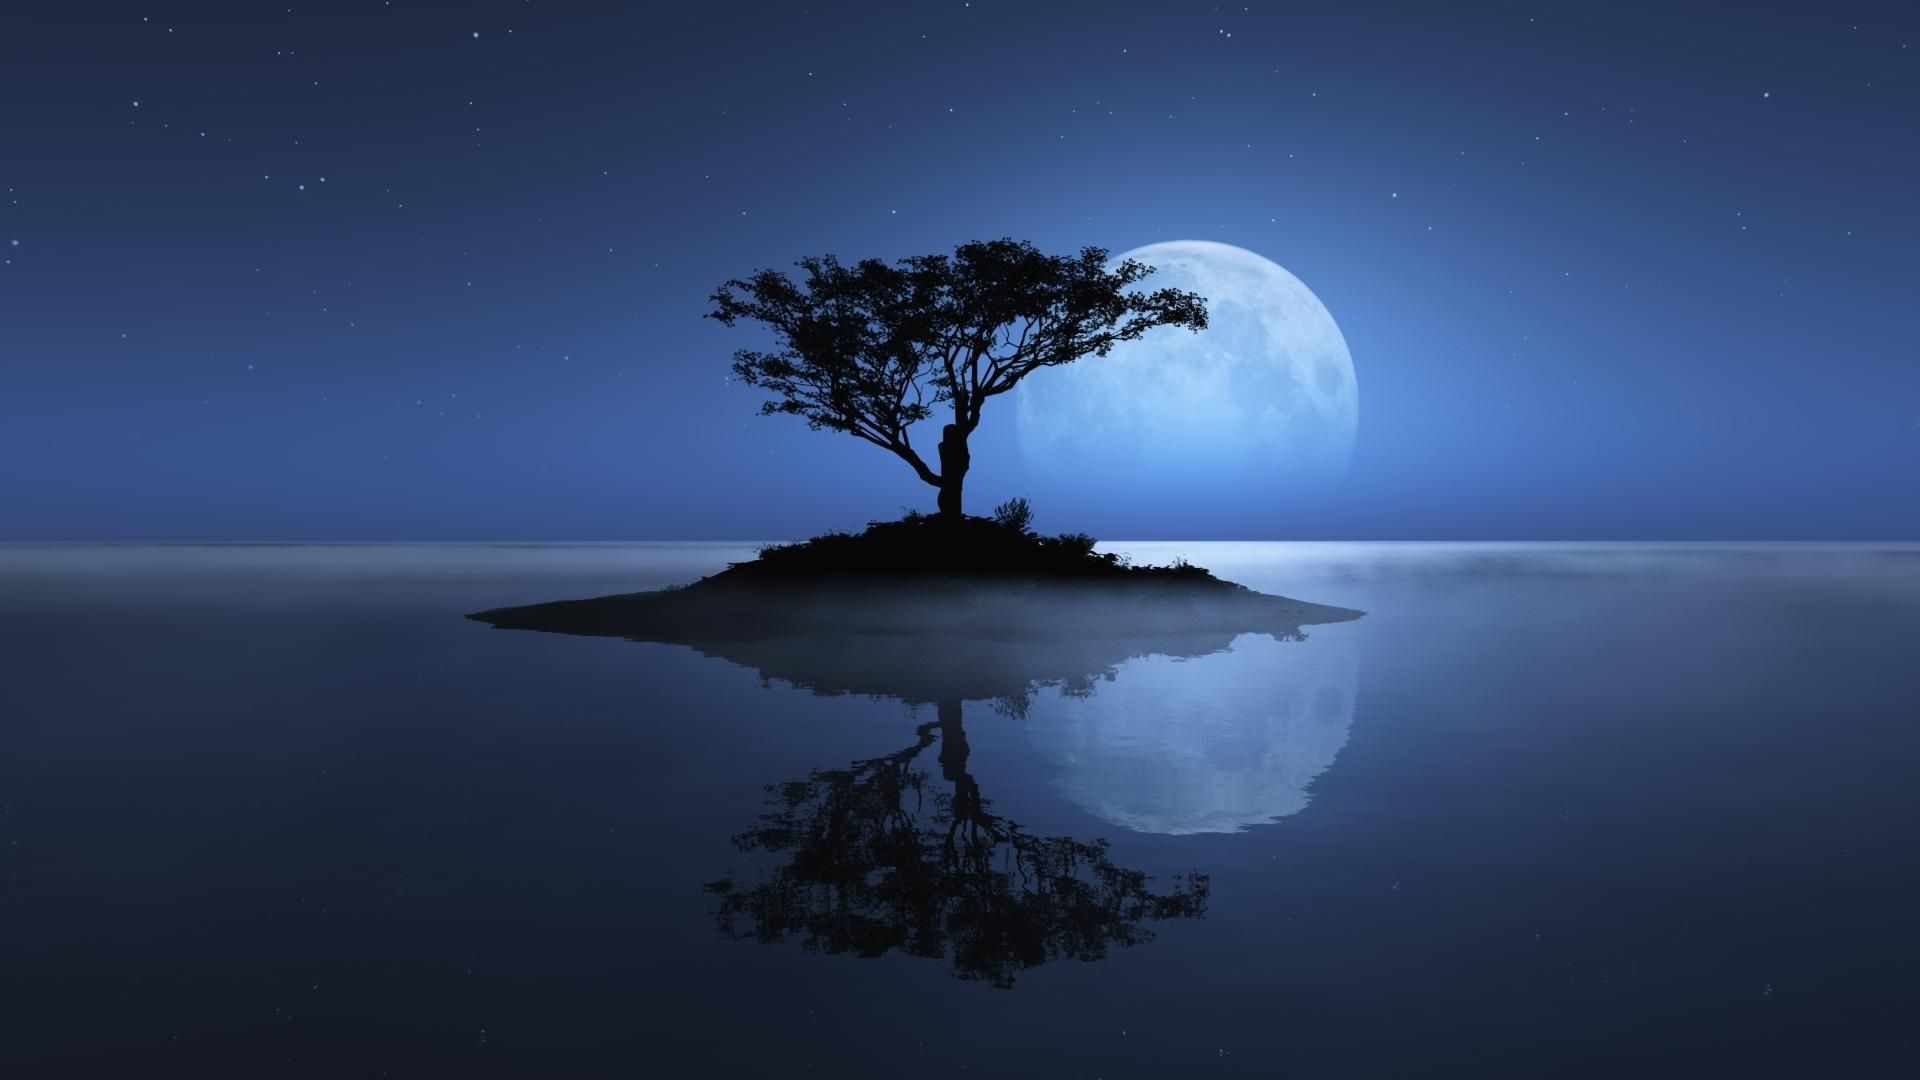 Falling Water Wallpaper 1080p 3d Nature Wallpaper Full Moon Night Nature Hd Wallpapers